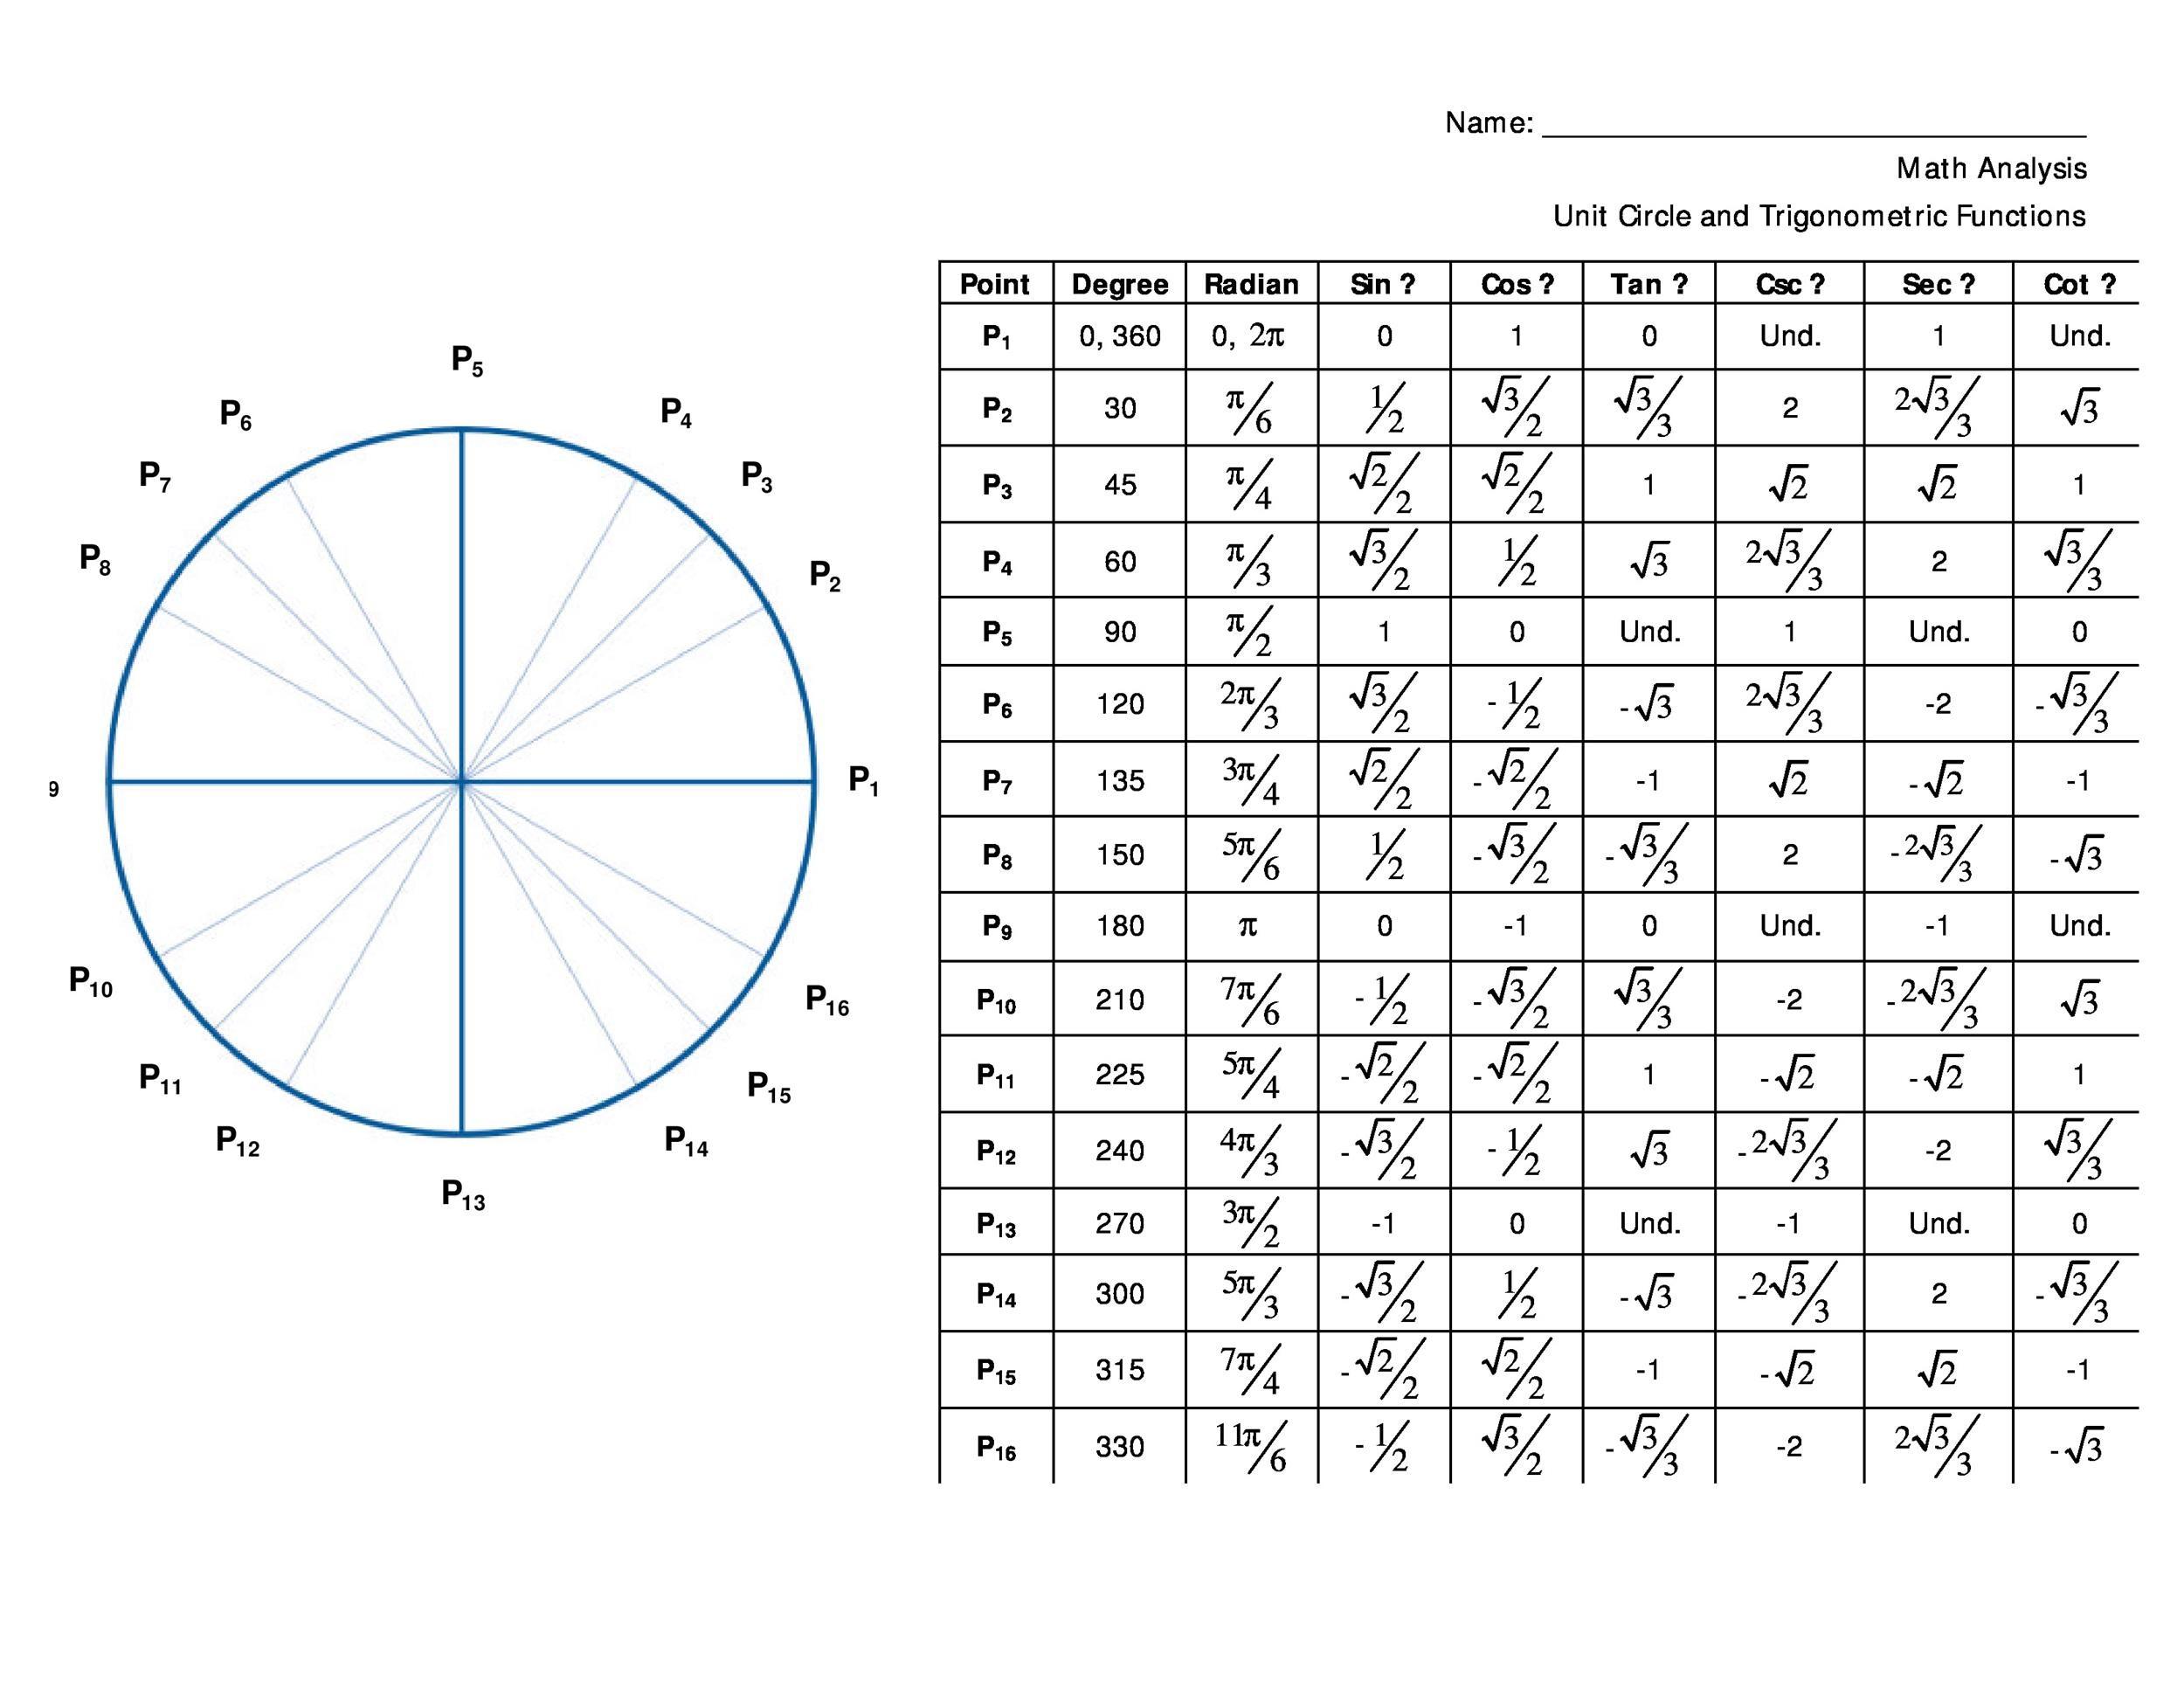 42 Printable Unit Circle Charts  Diagrams (Sin, Cos, Tan, Cot etc)